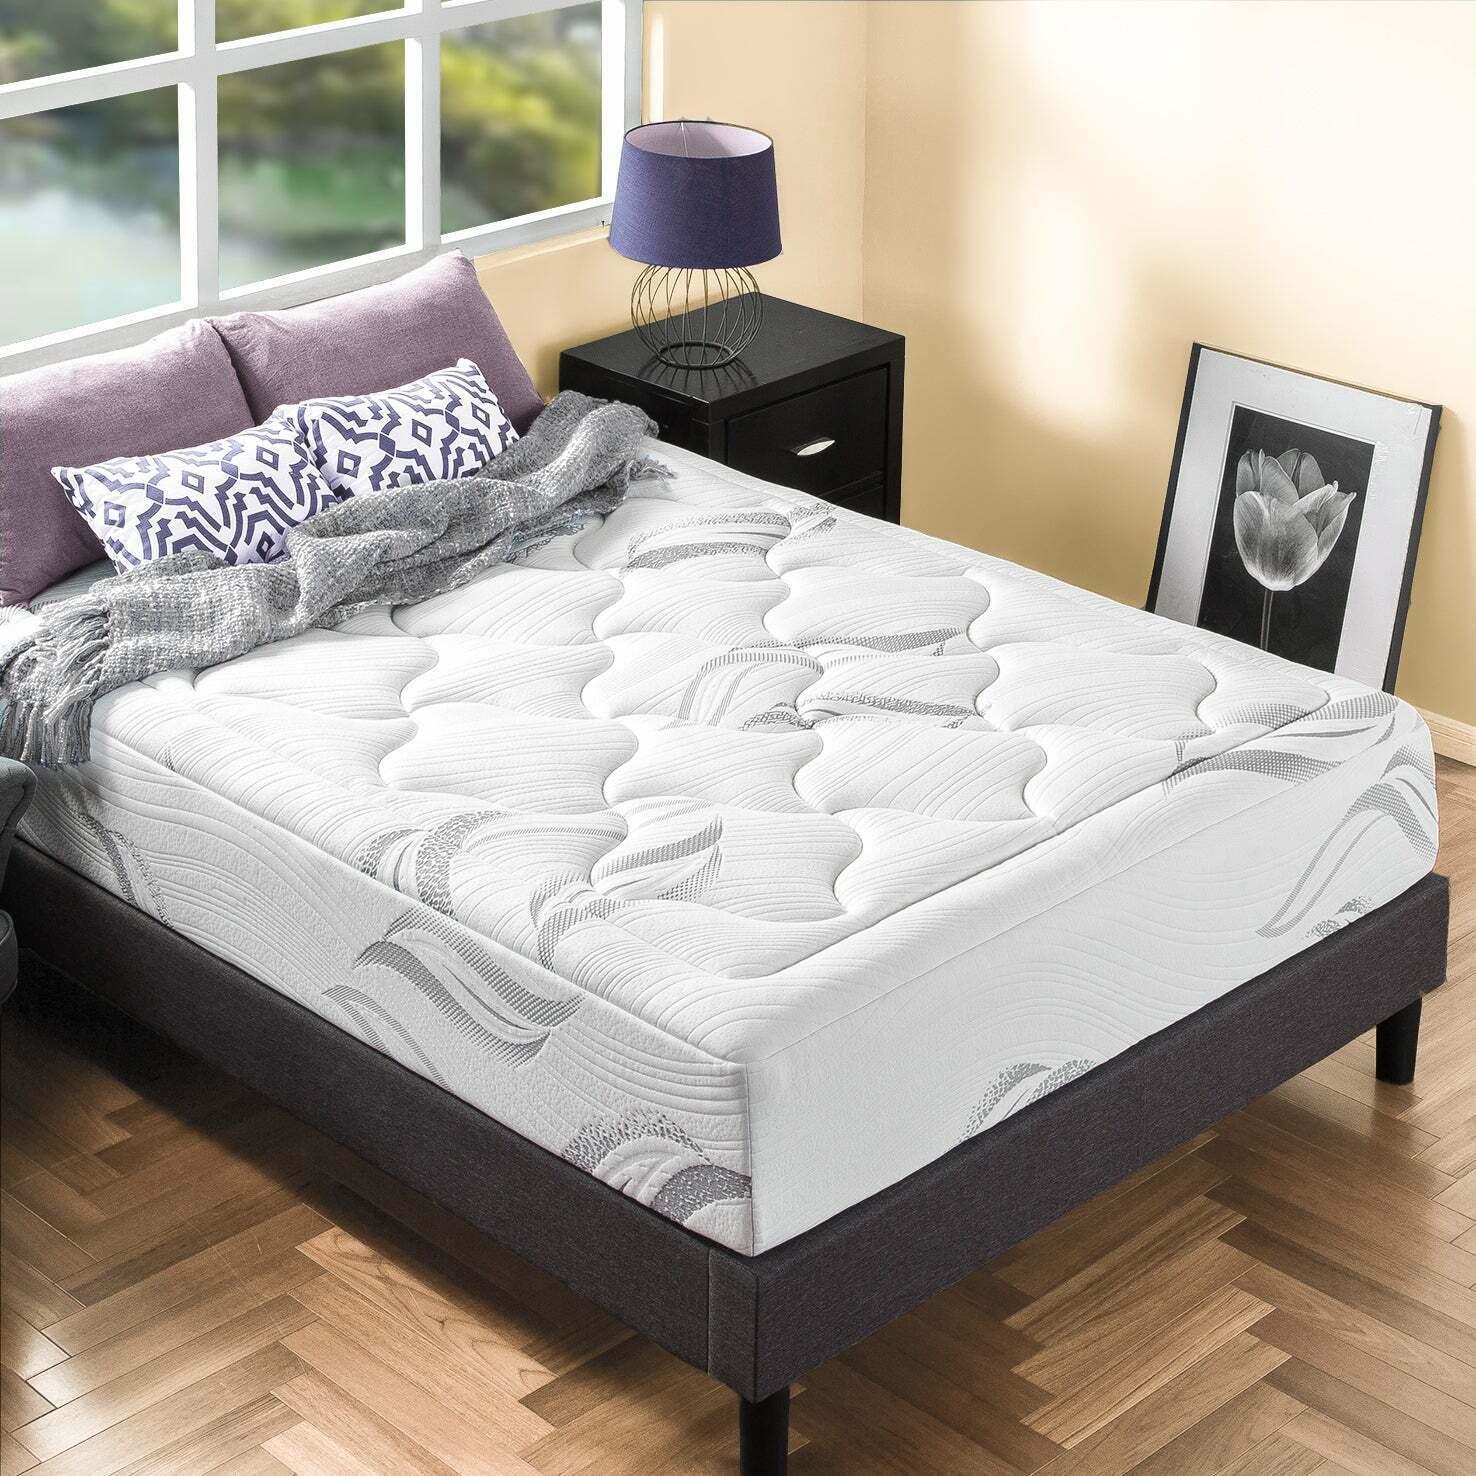 thumbnail 40 - Zinus Mattress Queen Double King Single Bed Memory Foam Pocket Spring Hybrid